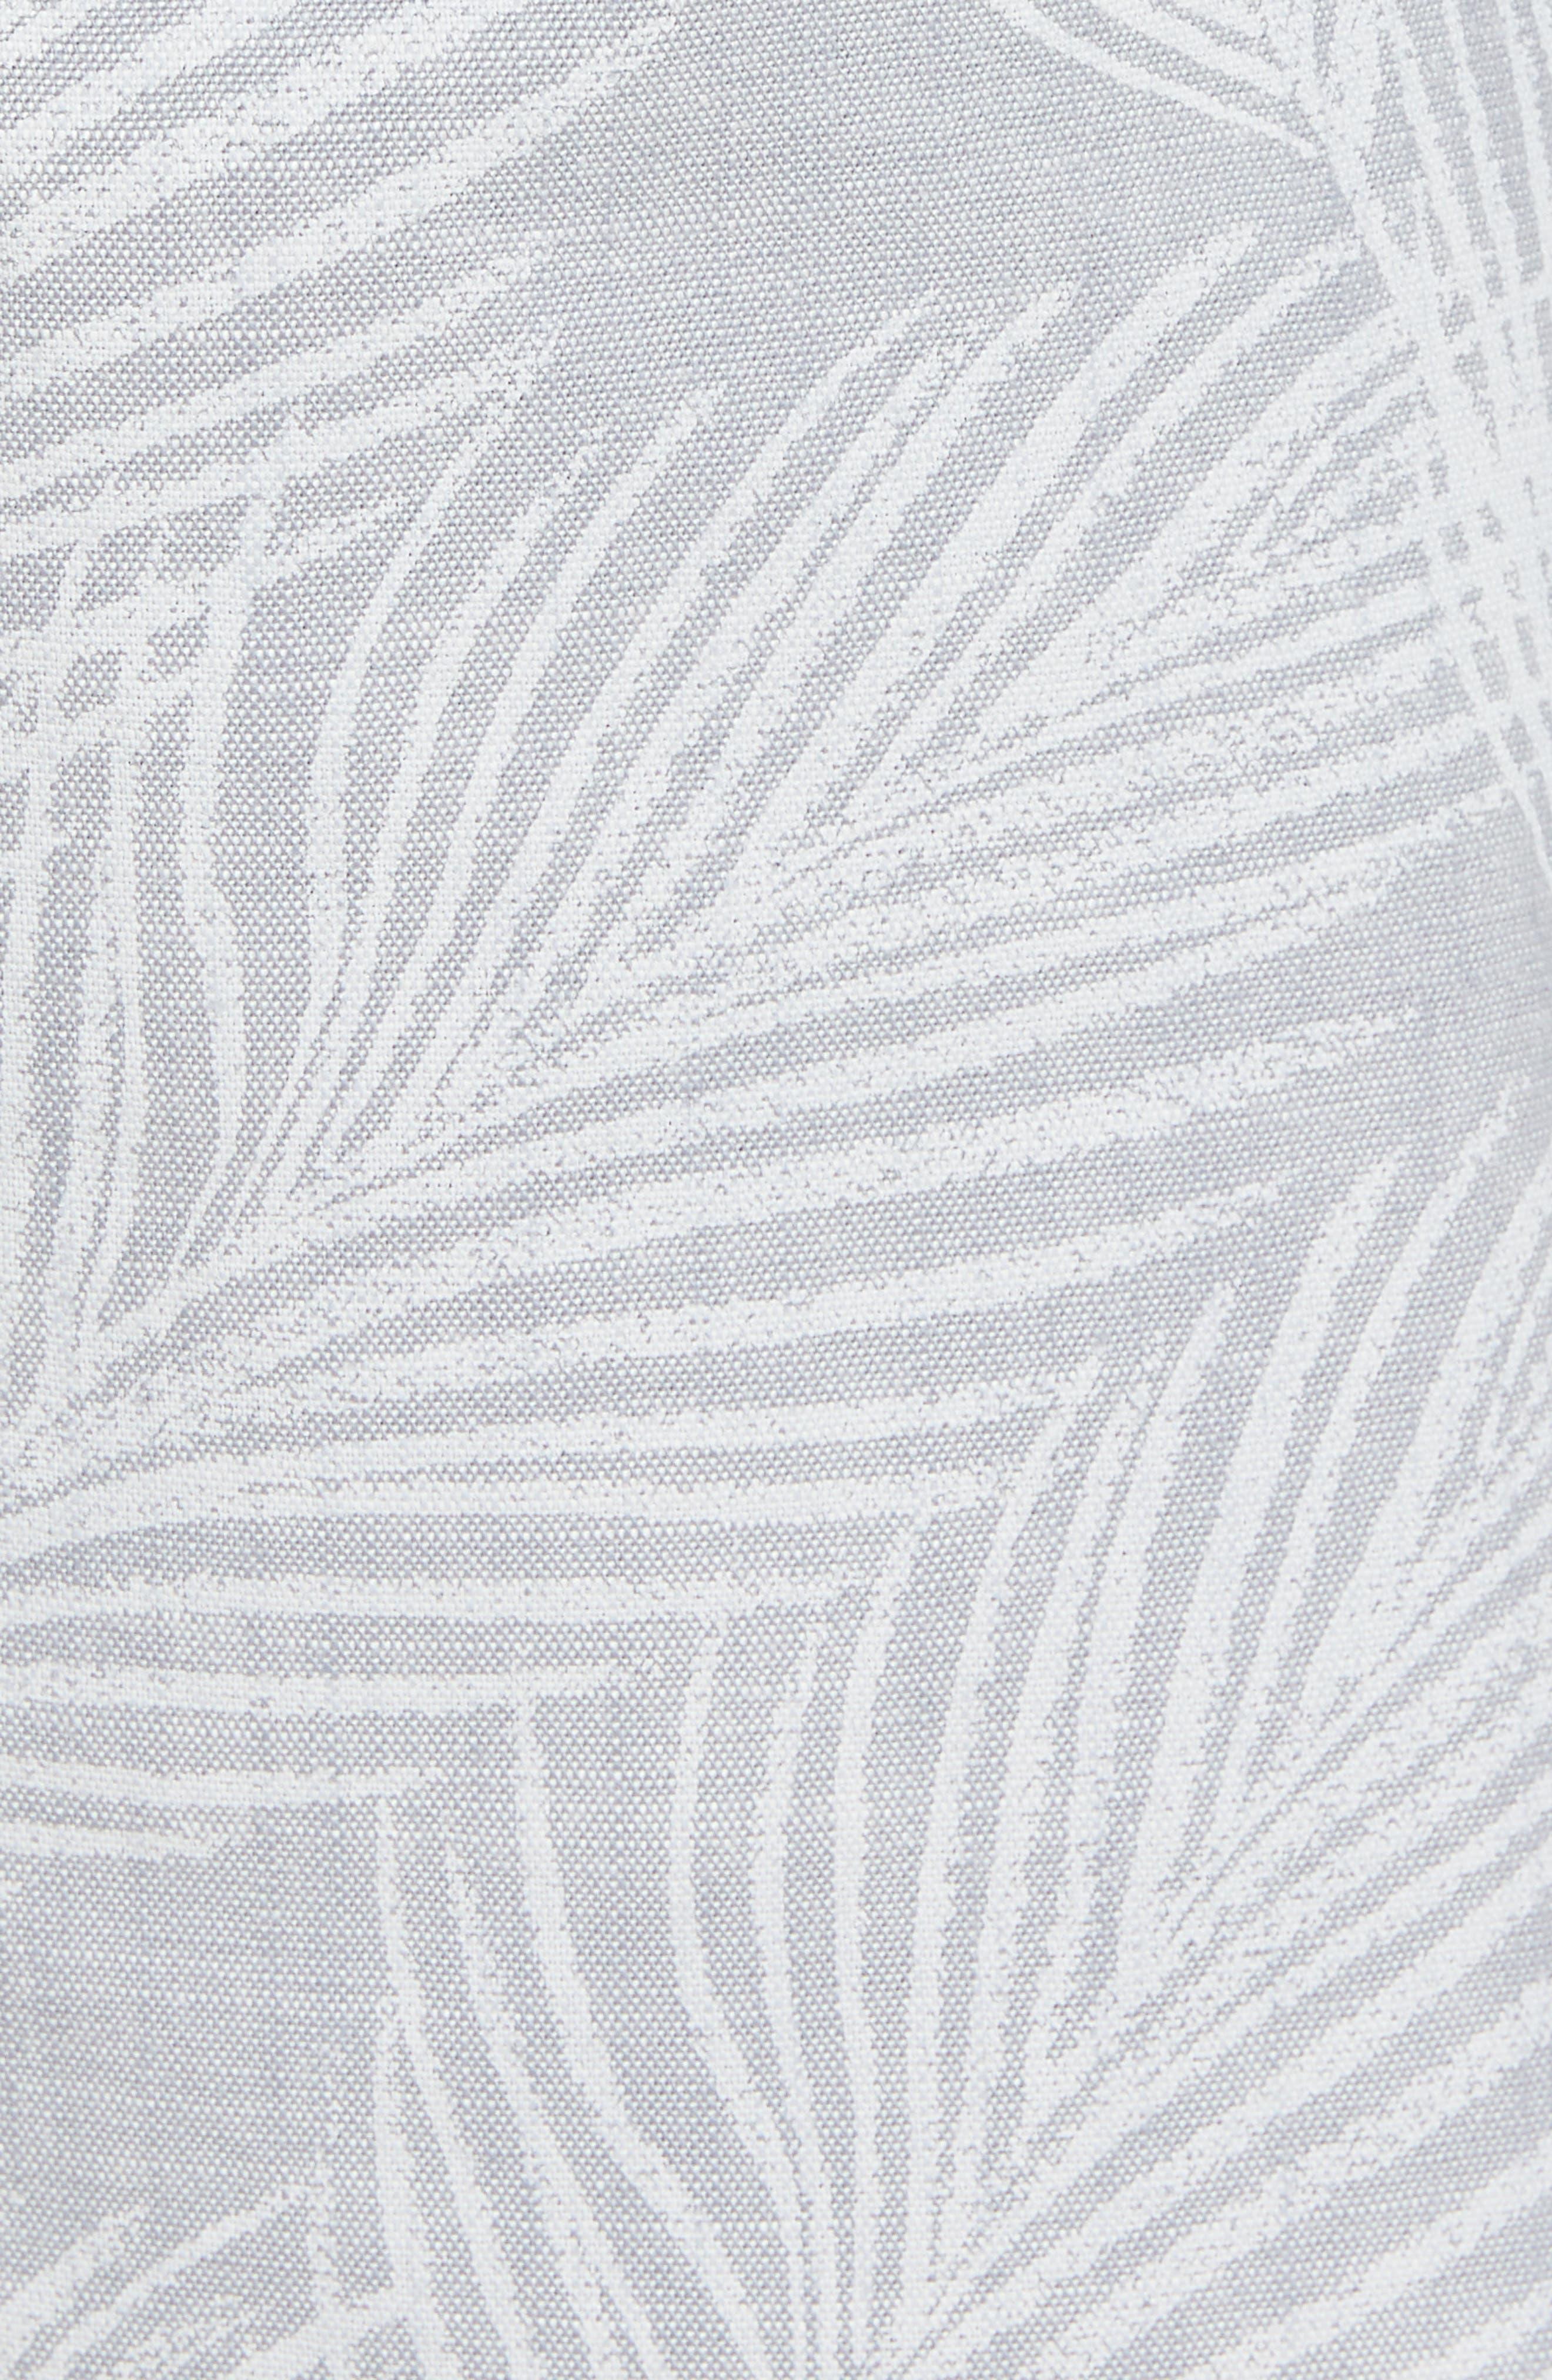 Print Stretch Chino Shorts,                             Alternate thumbnail 5, color,                             Breezy Palms Chambray